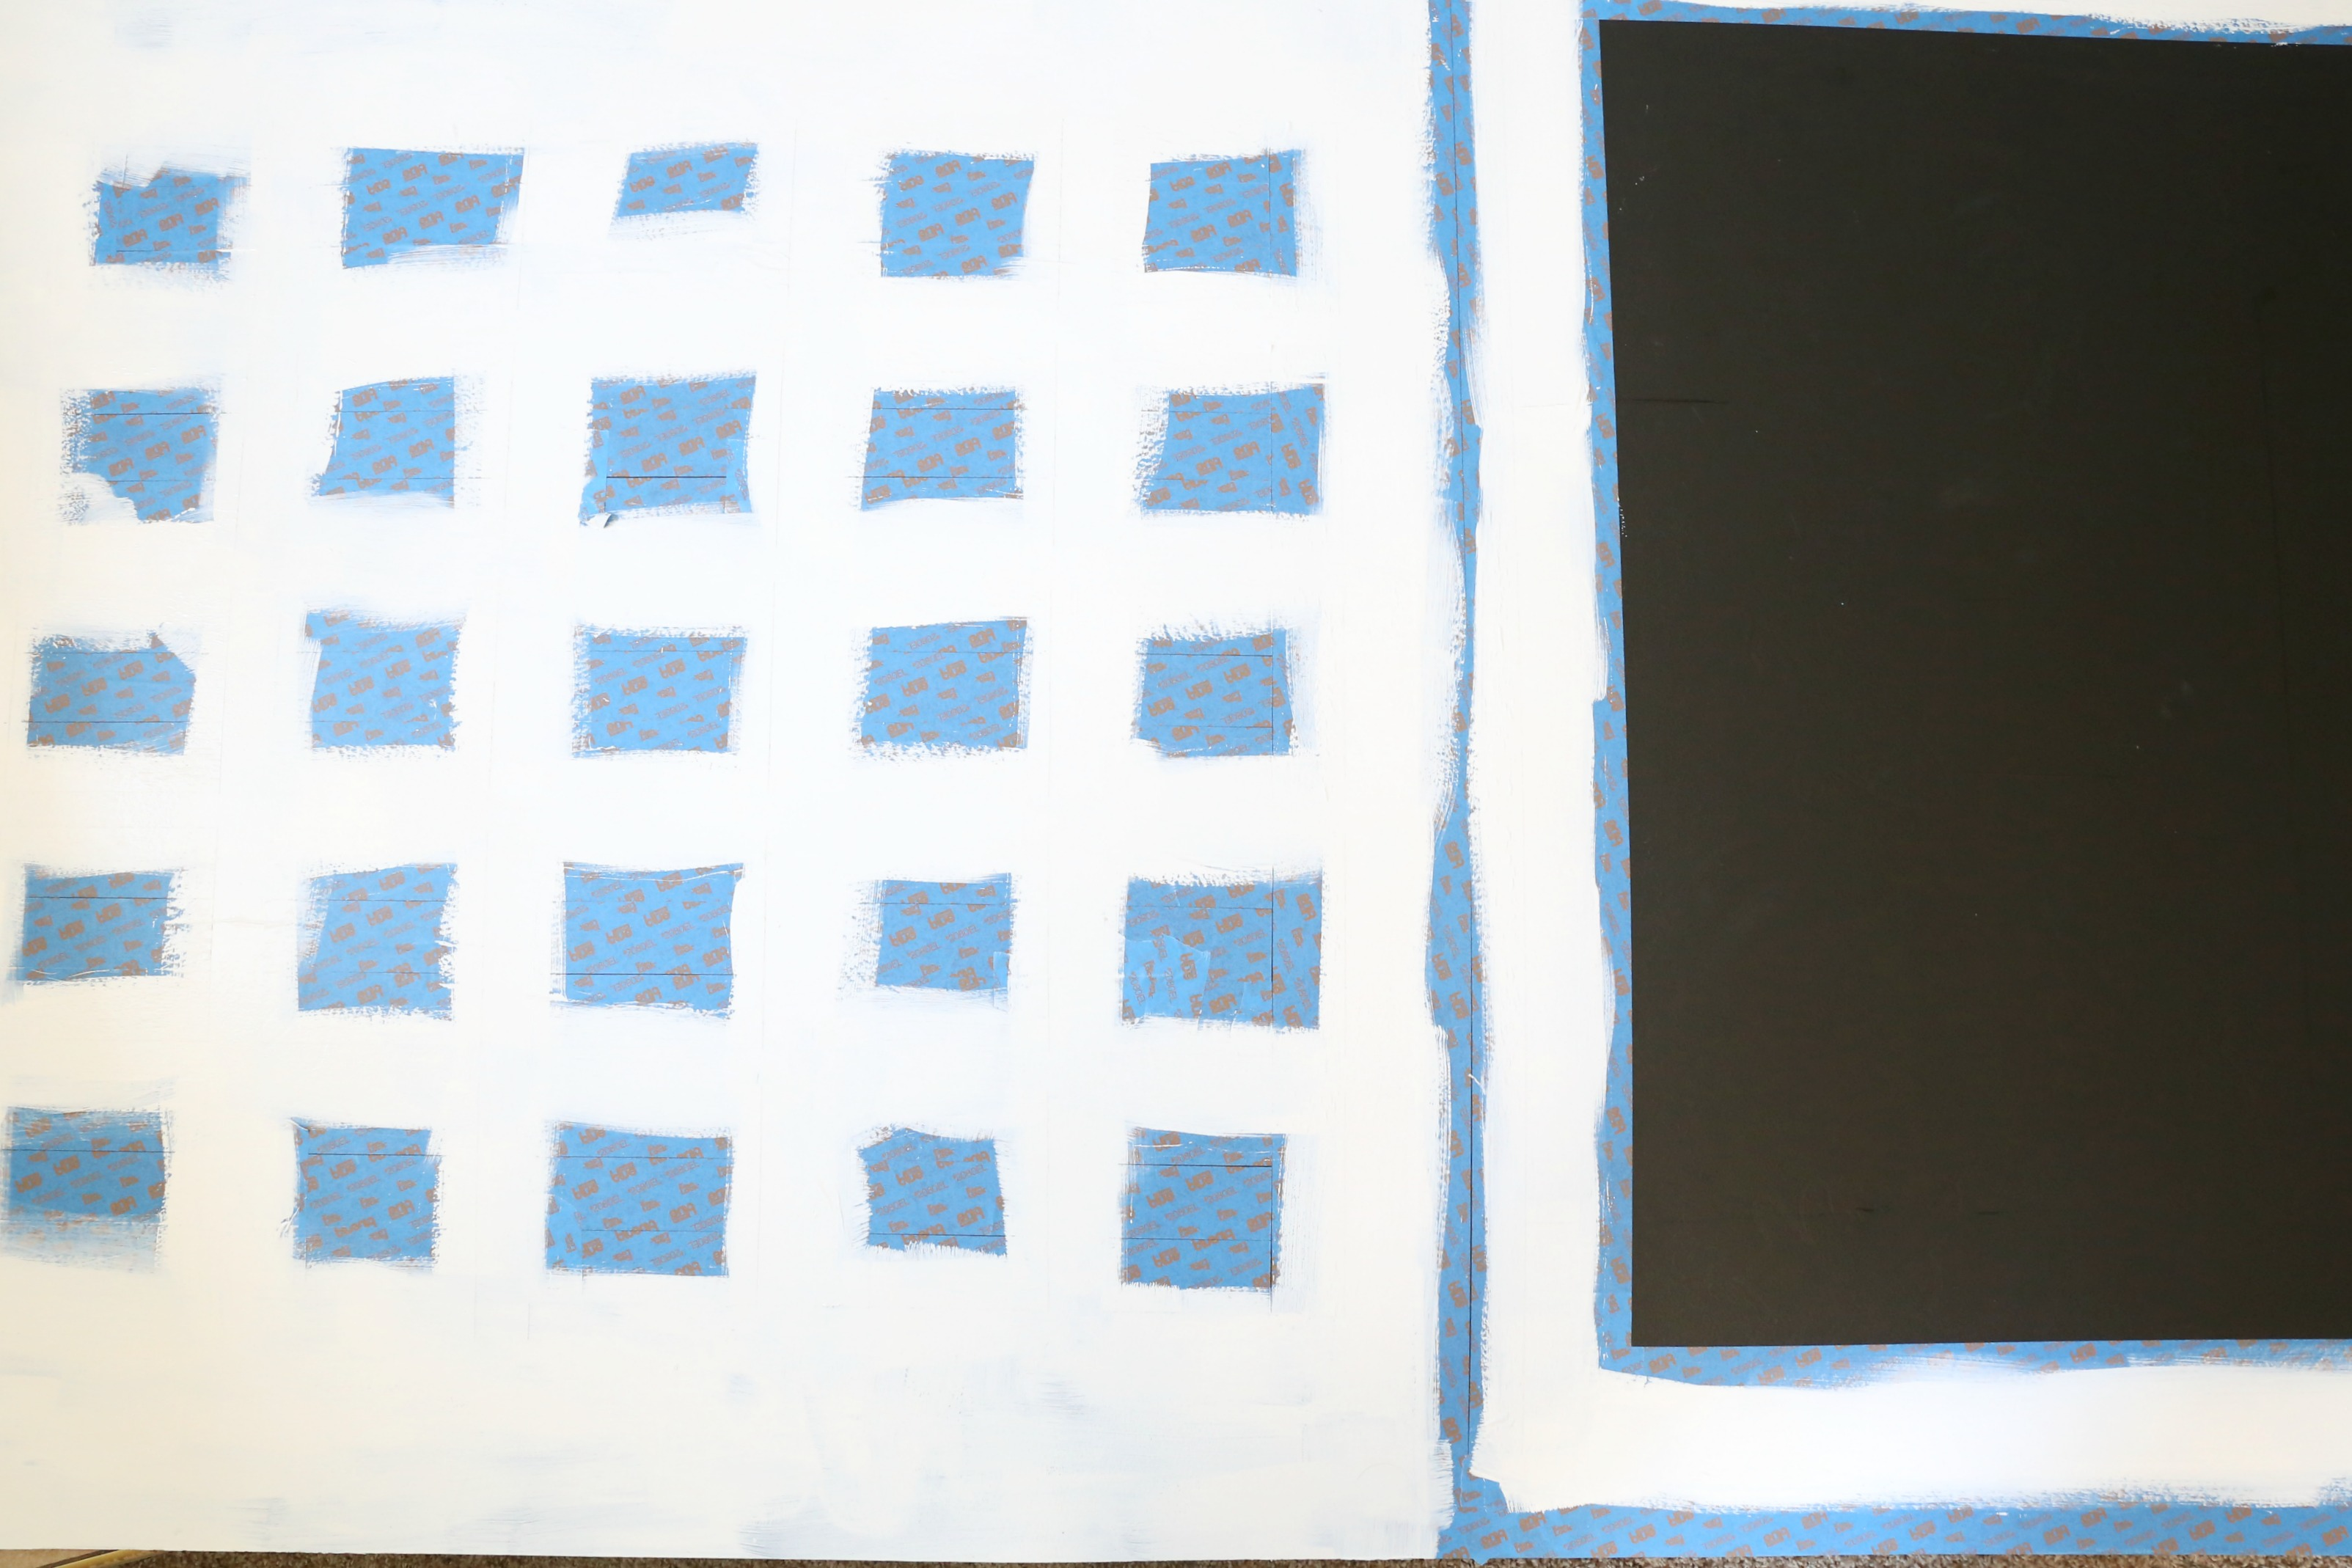 9- Paint around squares